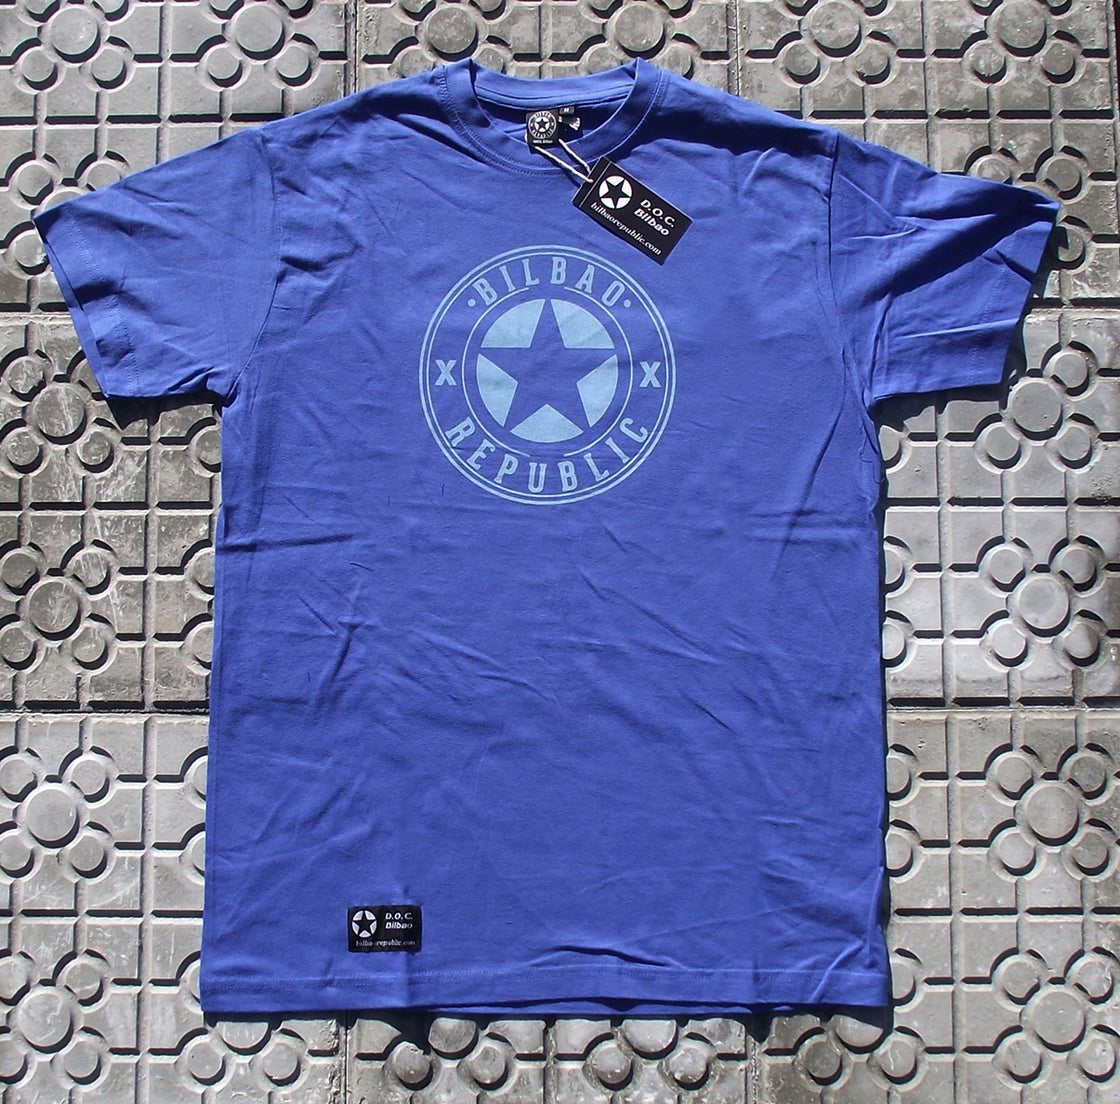 Image of Camiseta unisex Azul Bilbao